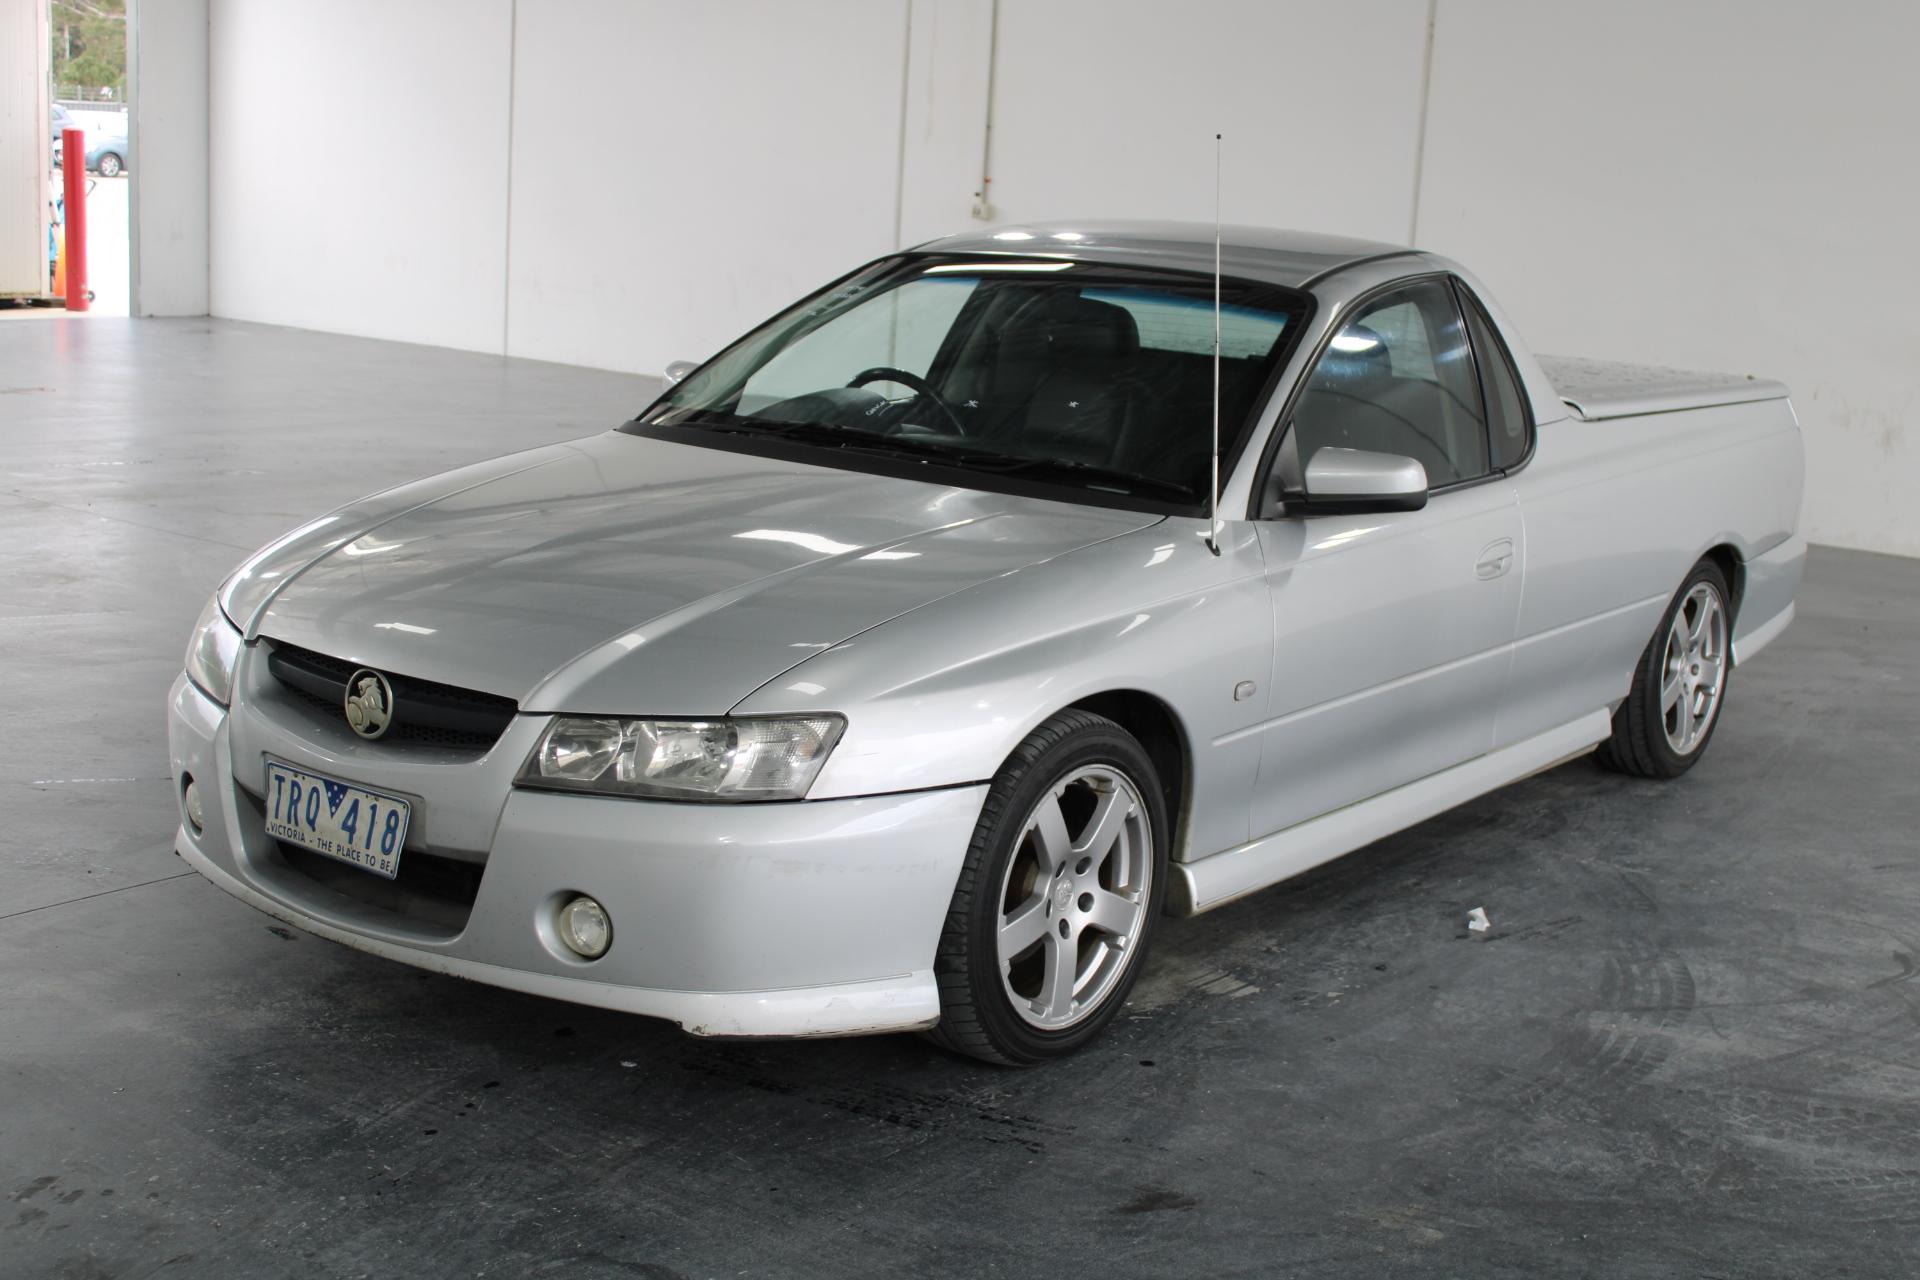 2005 Holden Commodore S VZ Manual Ute